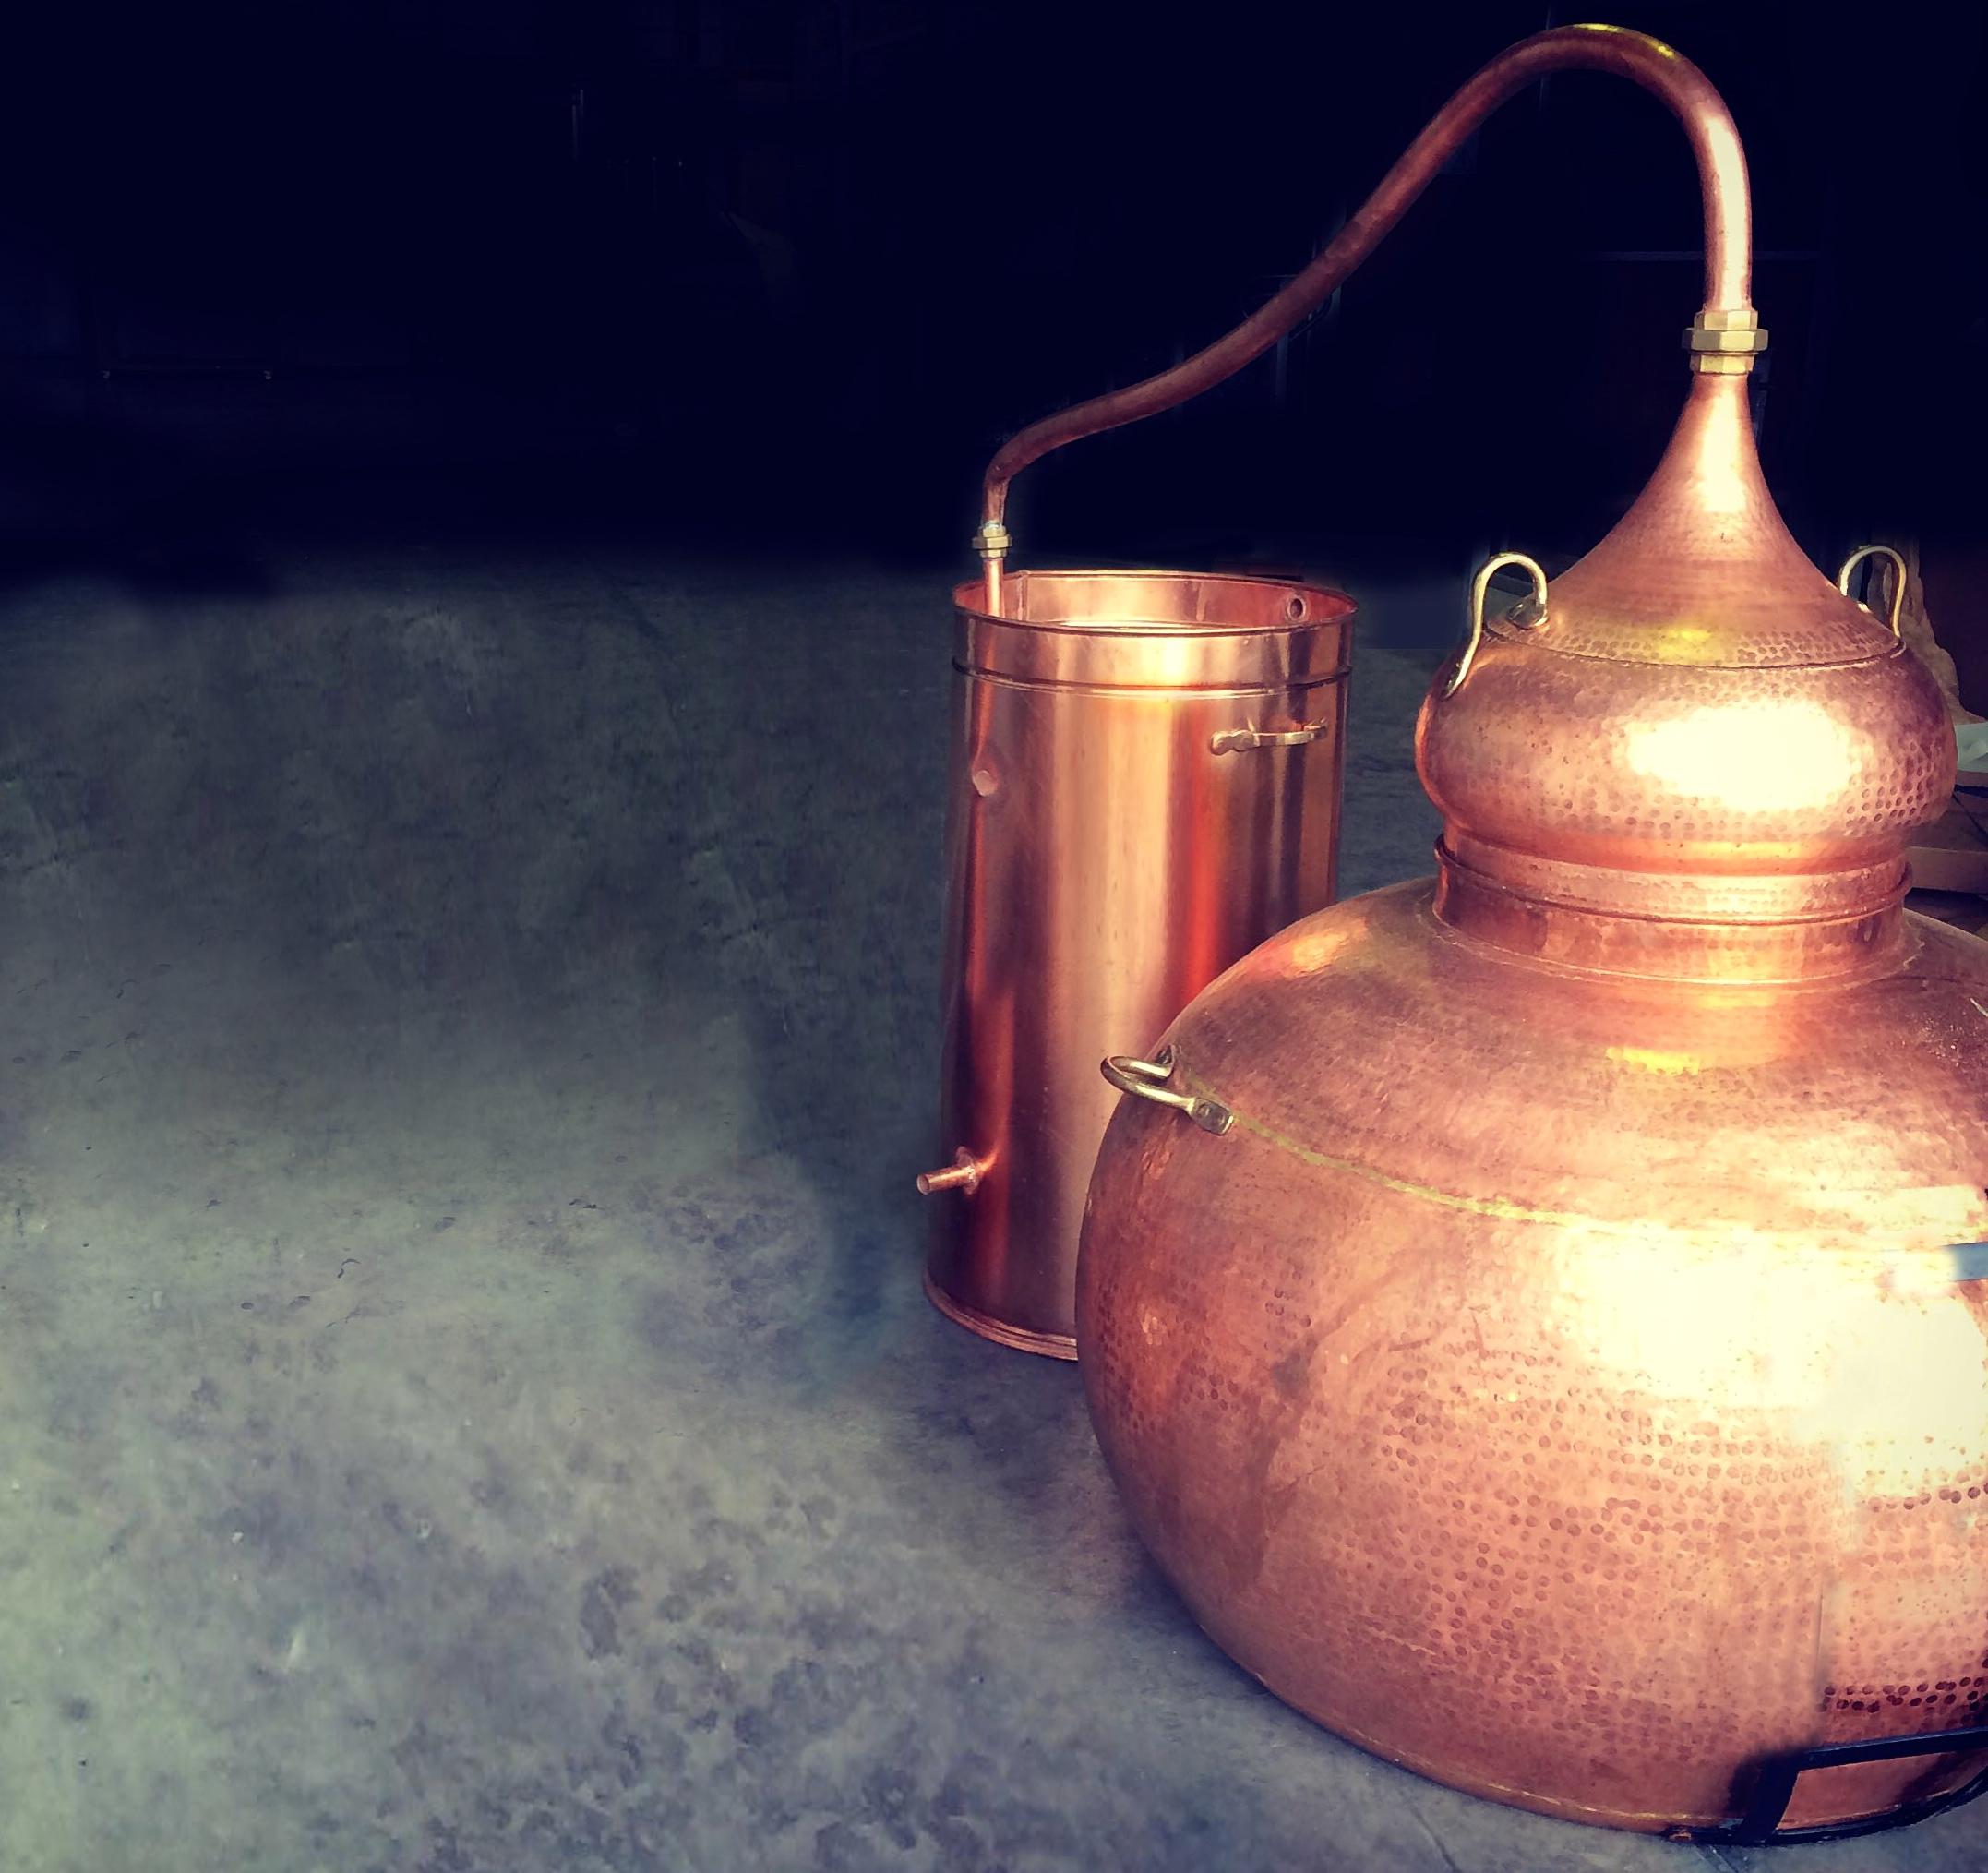 LAW Gin Ibiza Alembic Craft Gin